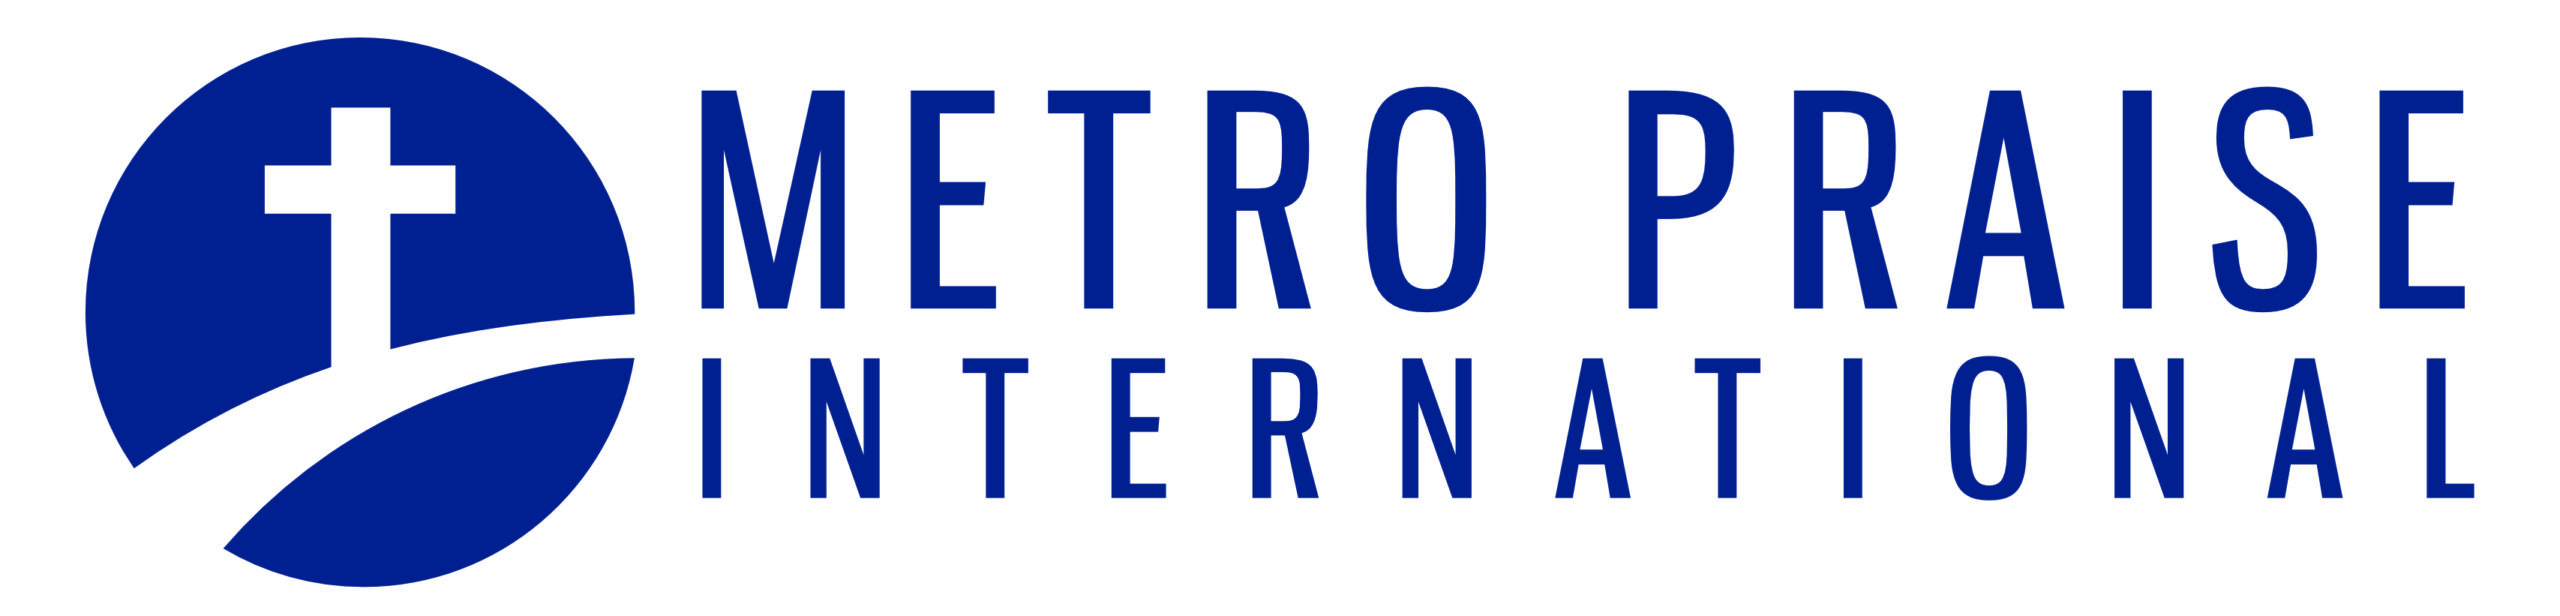 Metro Praise International Dallas